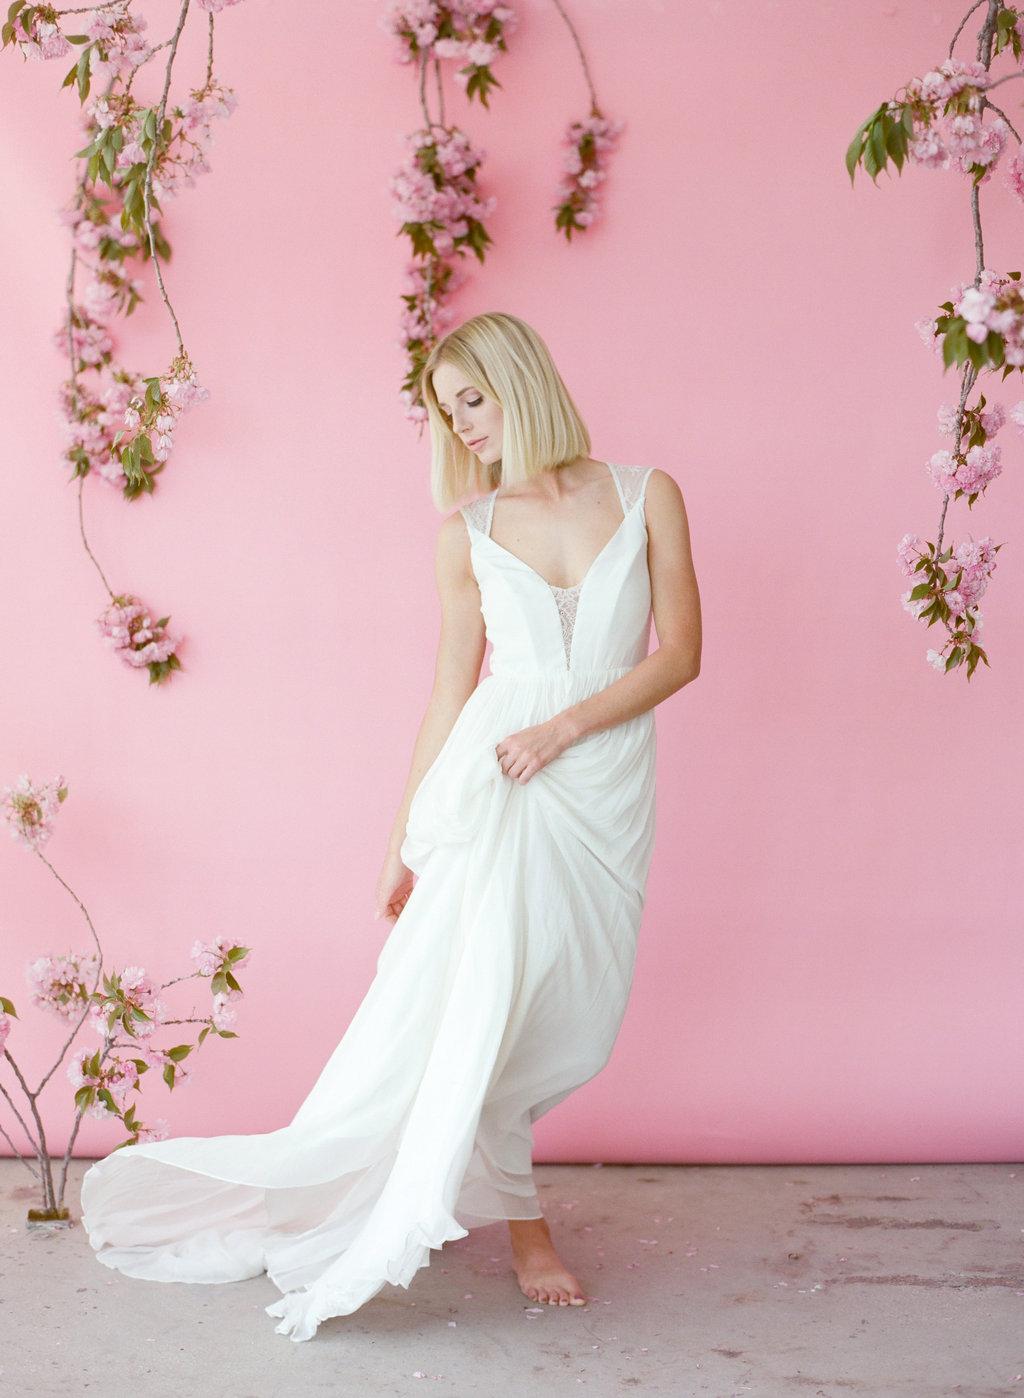 Leanne Marshall Wedding Dress - Heather Nan Photography